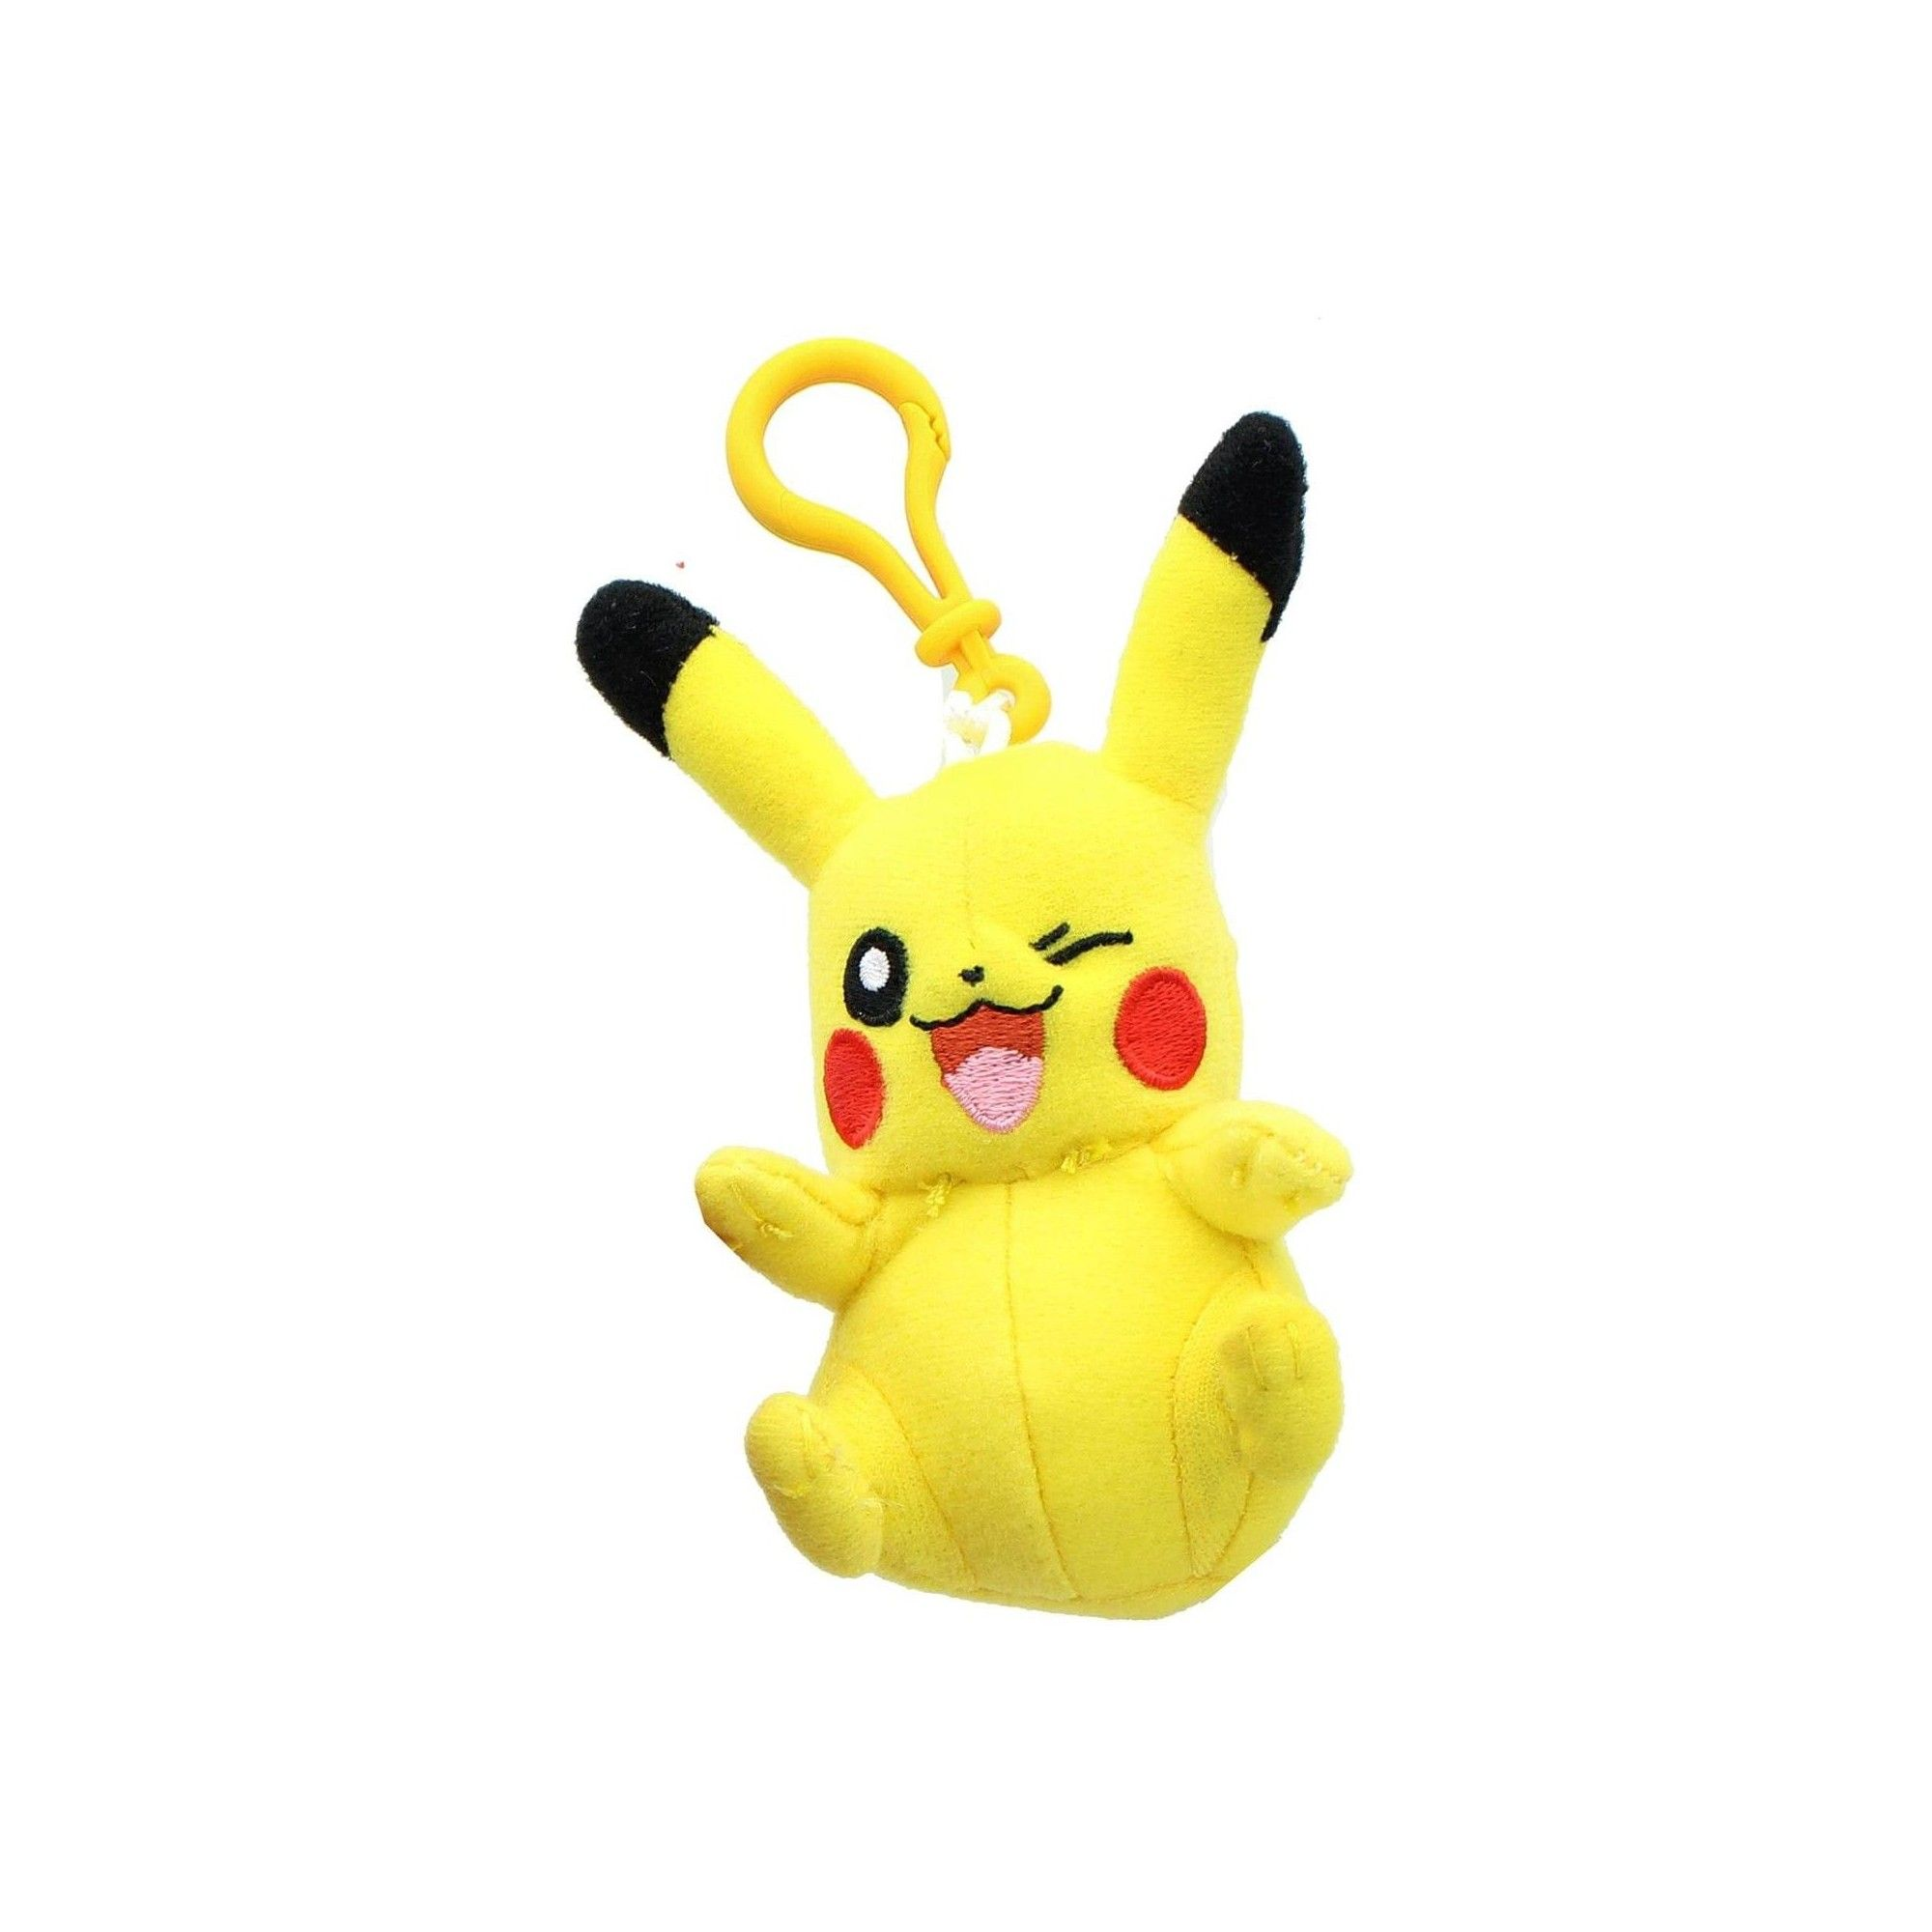 Pikachu Pokemon 3 Inch Plush Clip On